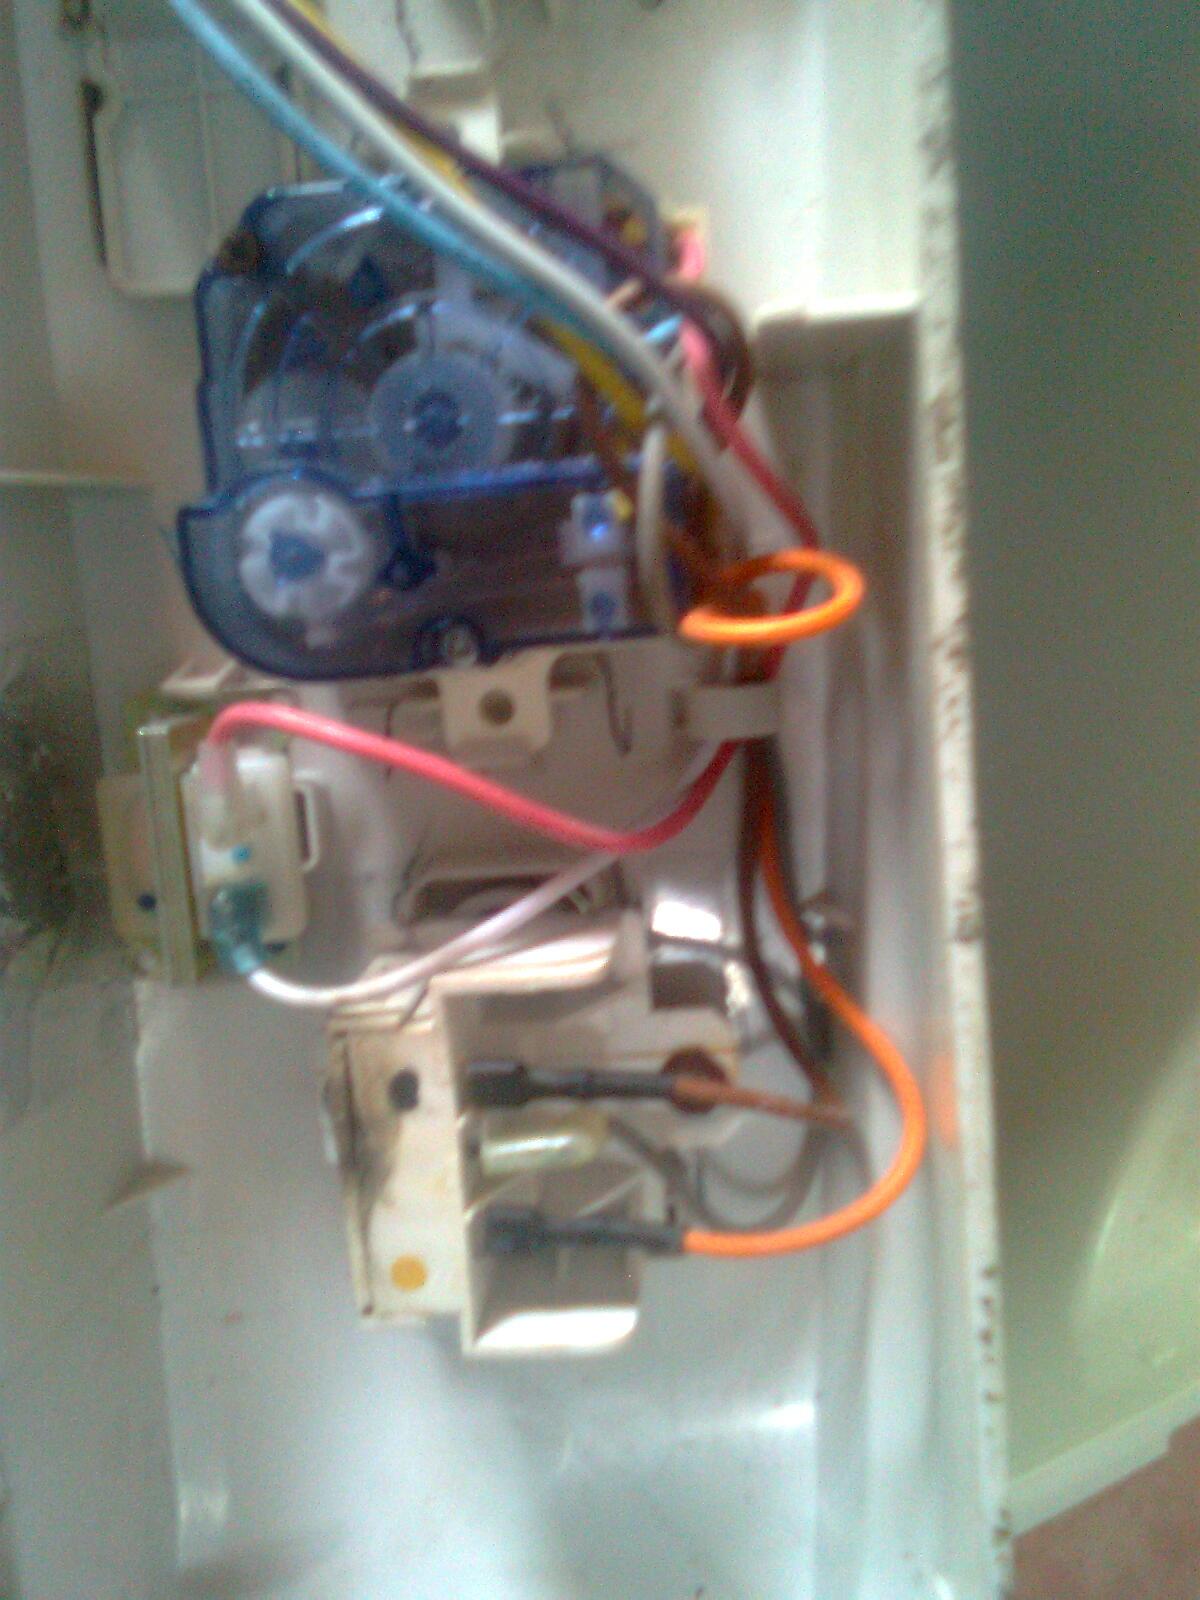 Service Washing Machine Ernakulam Aluva Angamaly Kochi Vytilla Ifb Elena Wiring Diagram District Kothamangalam Kalamassery Edappaly Kaloor 8907975948 Vyppin Parur Kodugallur Trichur